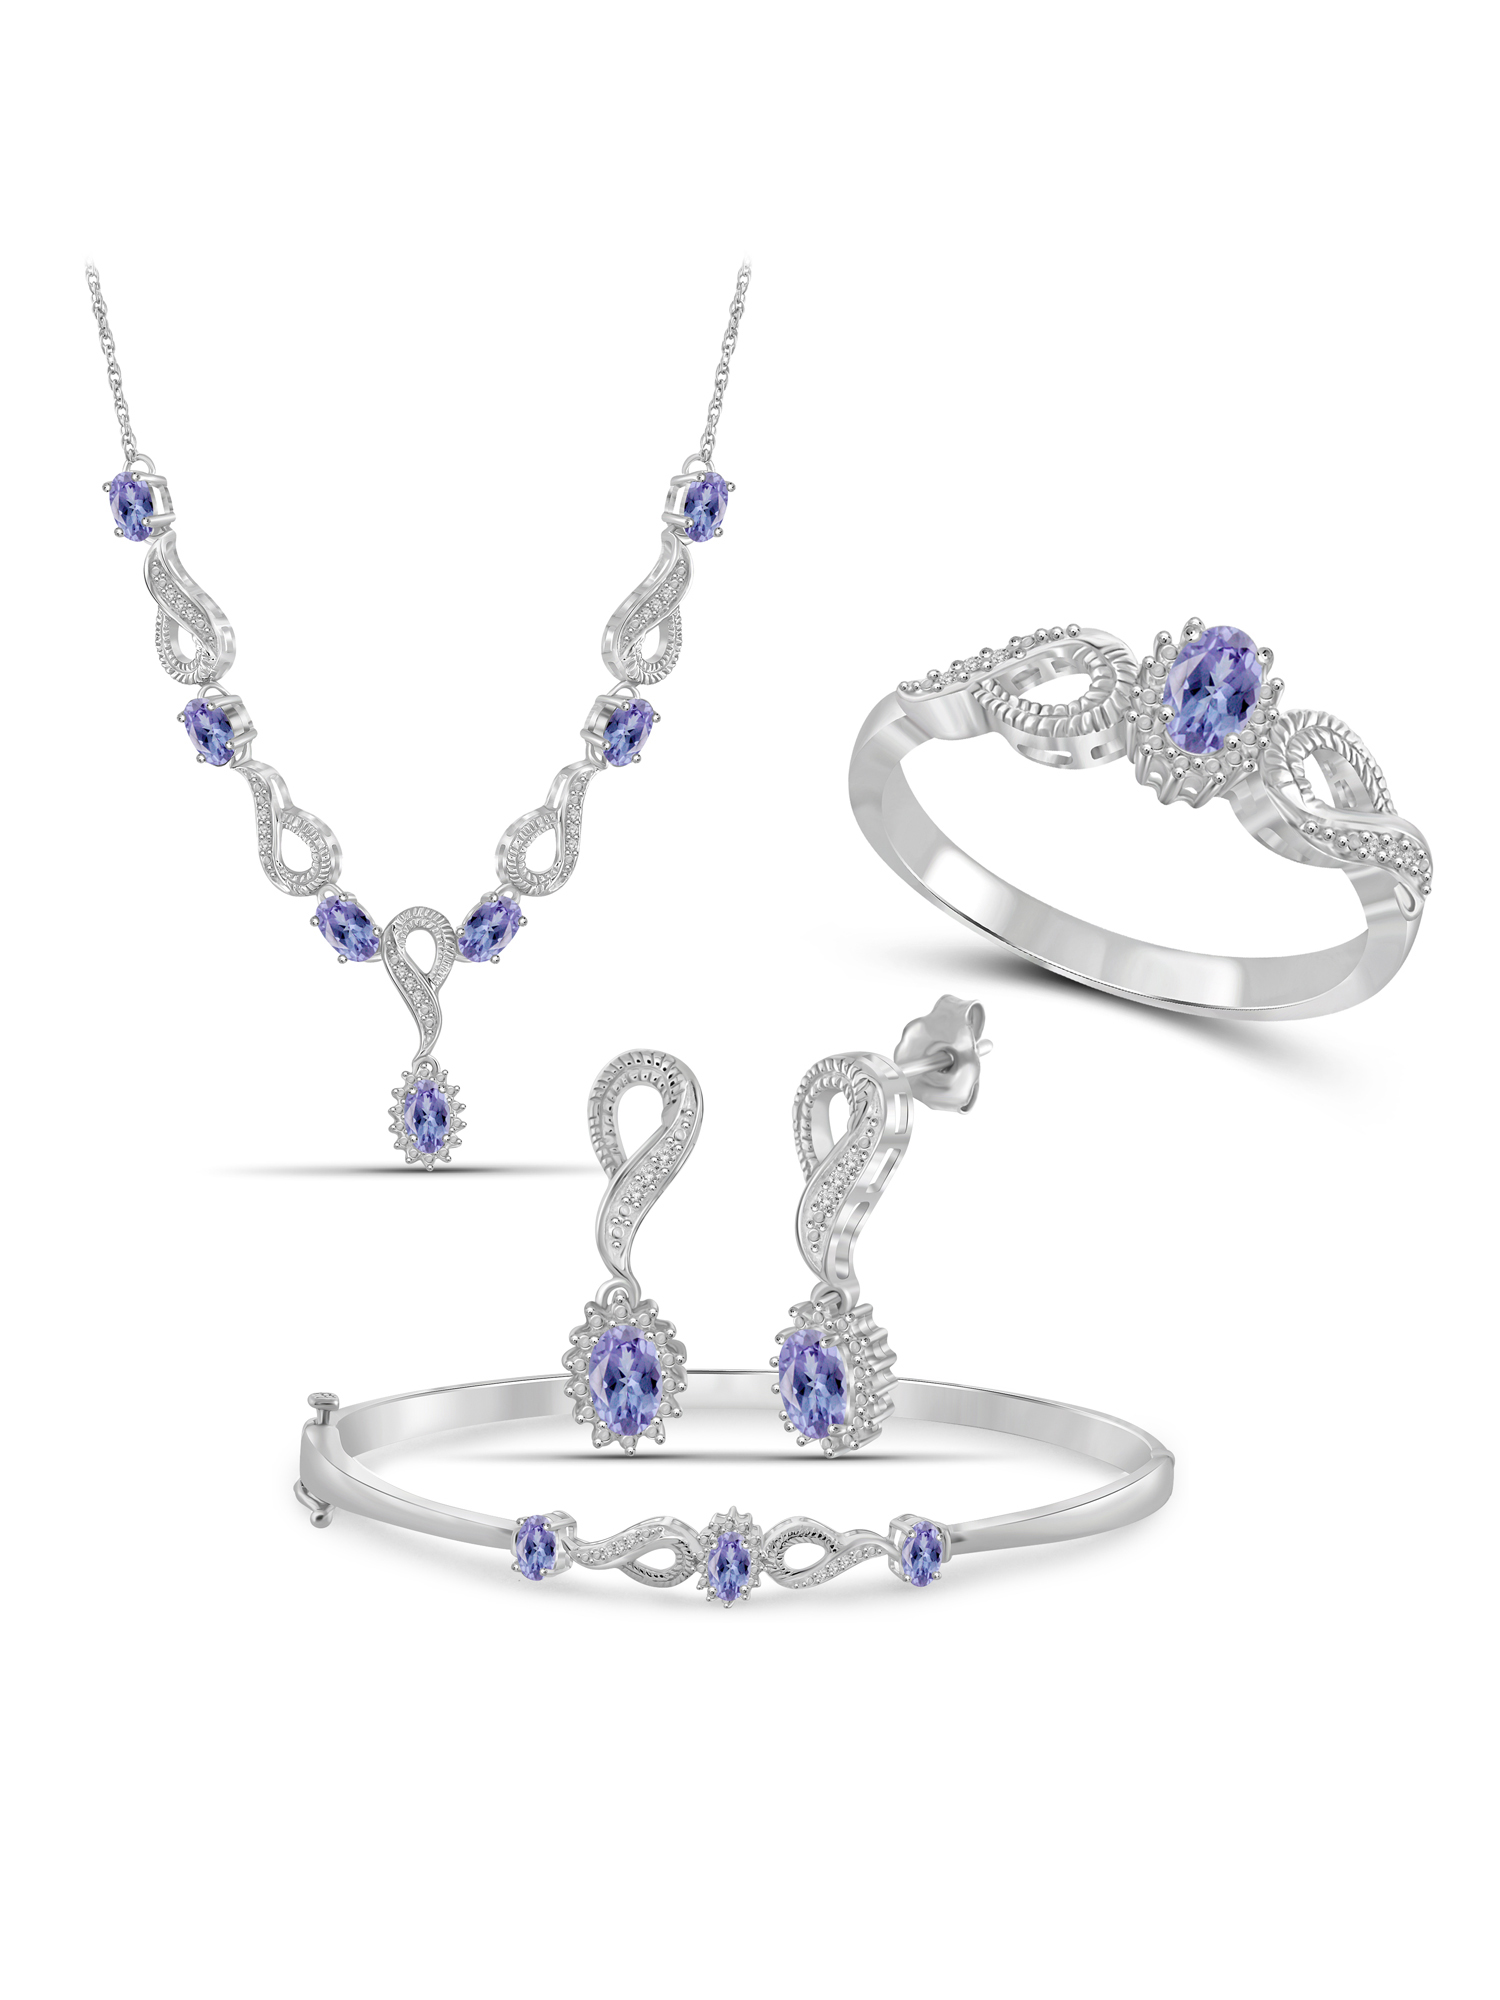 JewelersClub 3.00 Carat T.G.W. Tanzanite And White Diamond Accent Sterling Silver 4-Piece Jewelry set by JewelersClub